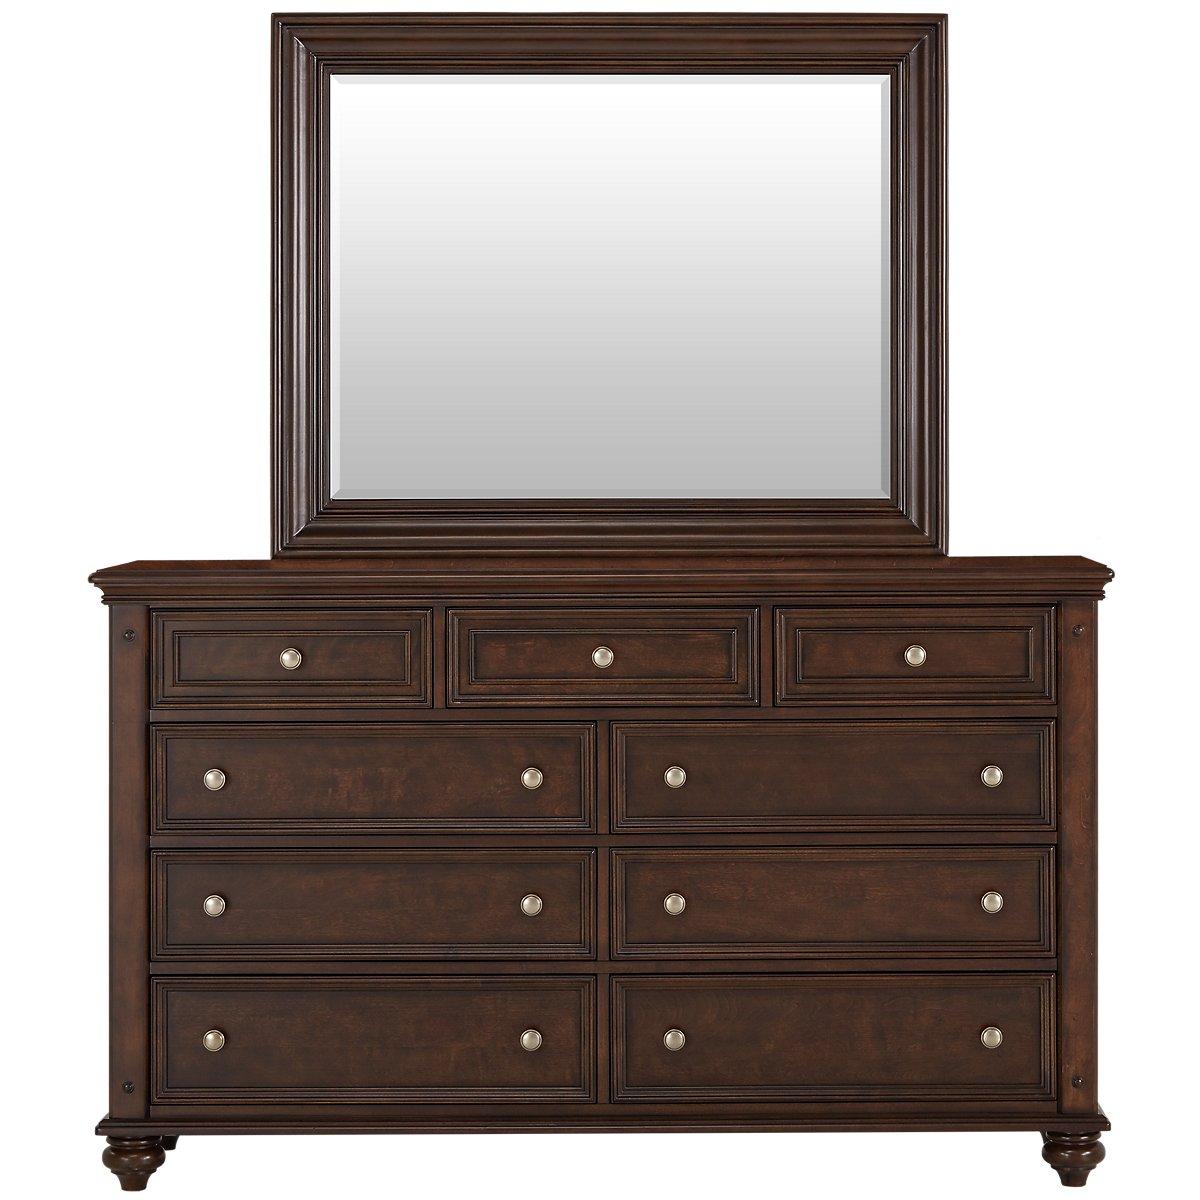 Savannah Dark Tone Wood Dresser & Mirror